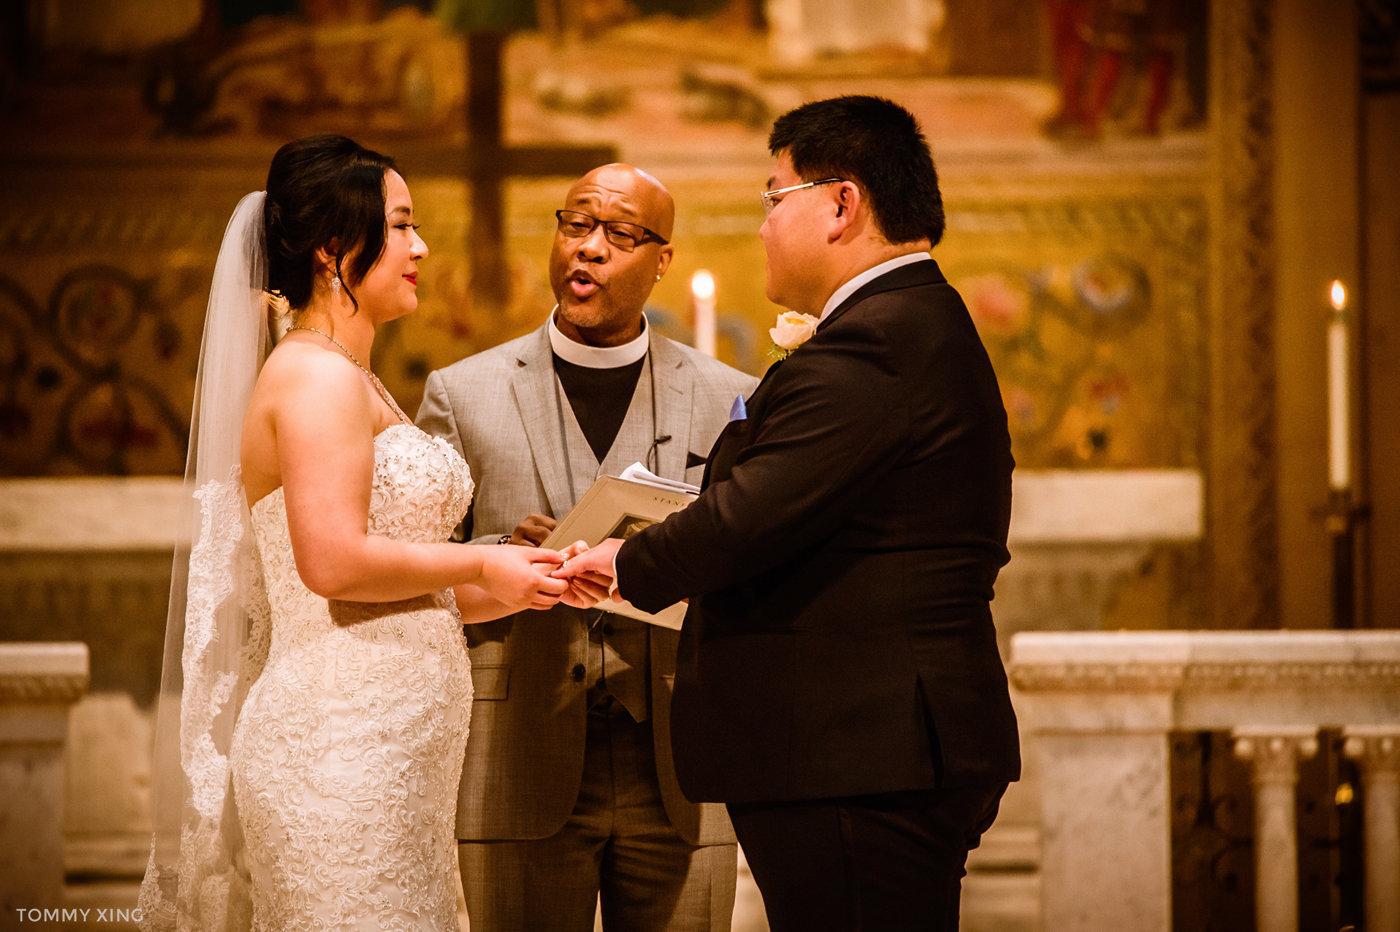 STANFORD MEMORIAL CHURCH WEDDING - Wenjie & Chengcheng - SAN FRANCISCO BAY AREA 斯坦福教堂婚礼跟拍 - 洛杉矶婚礼婚纱照摄影师 Tommy Xing Photography103.jpg